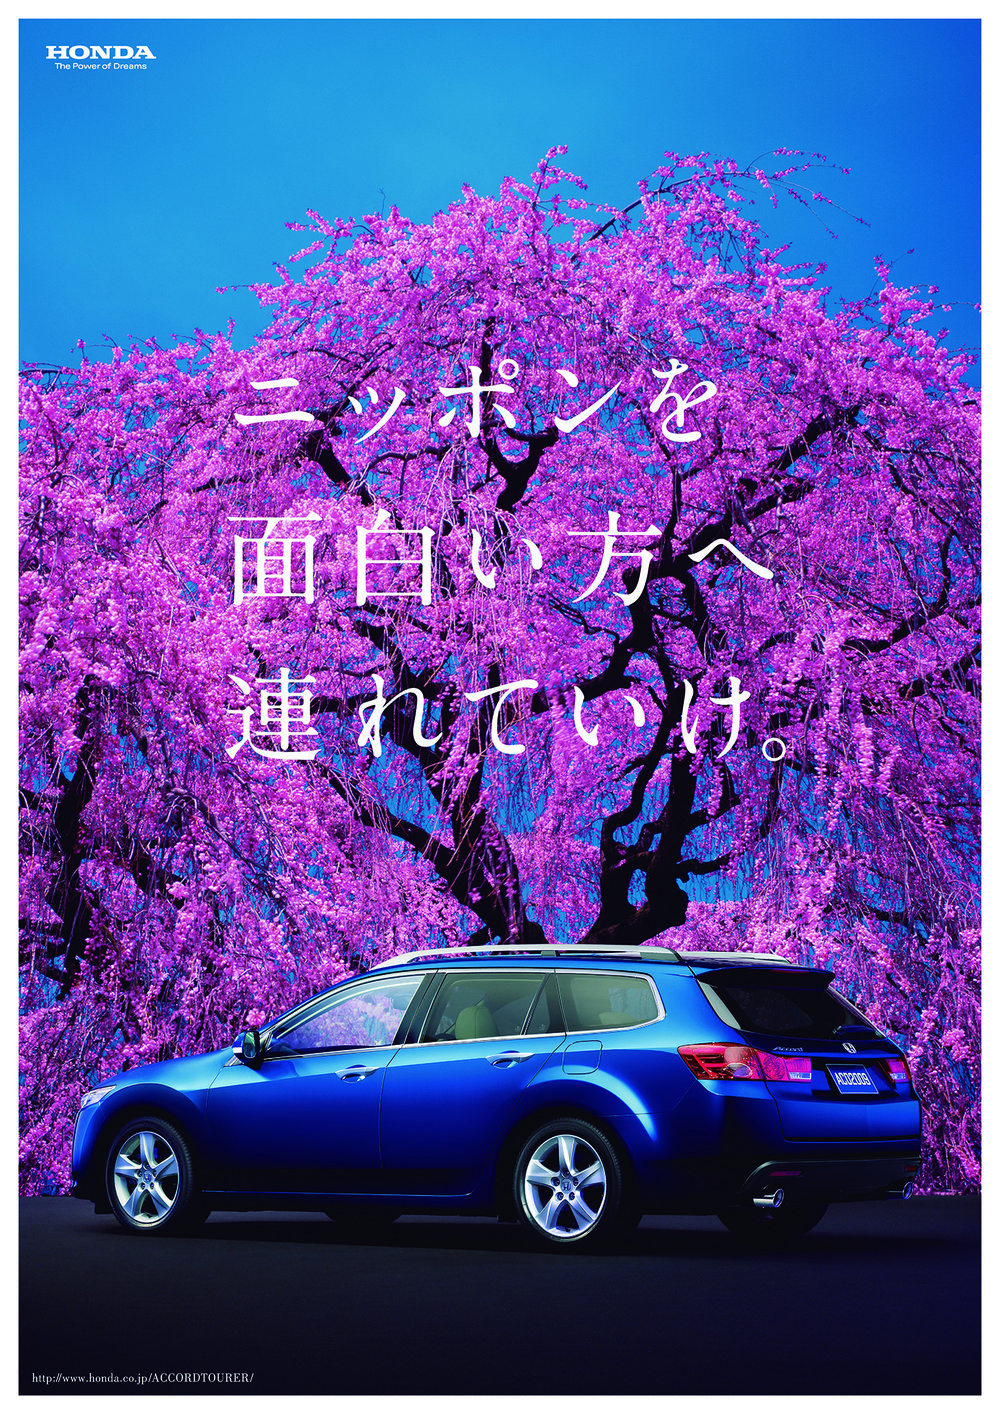 honda_accord_01_2000px_72dpi.jpg